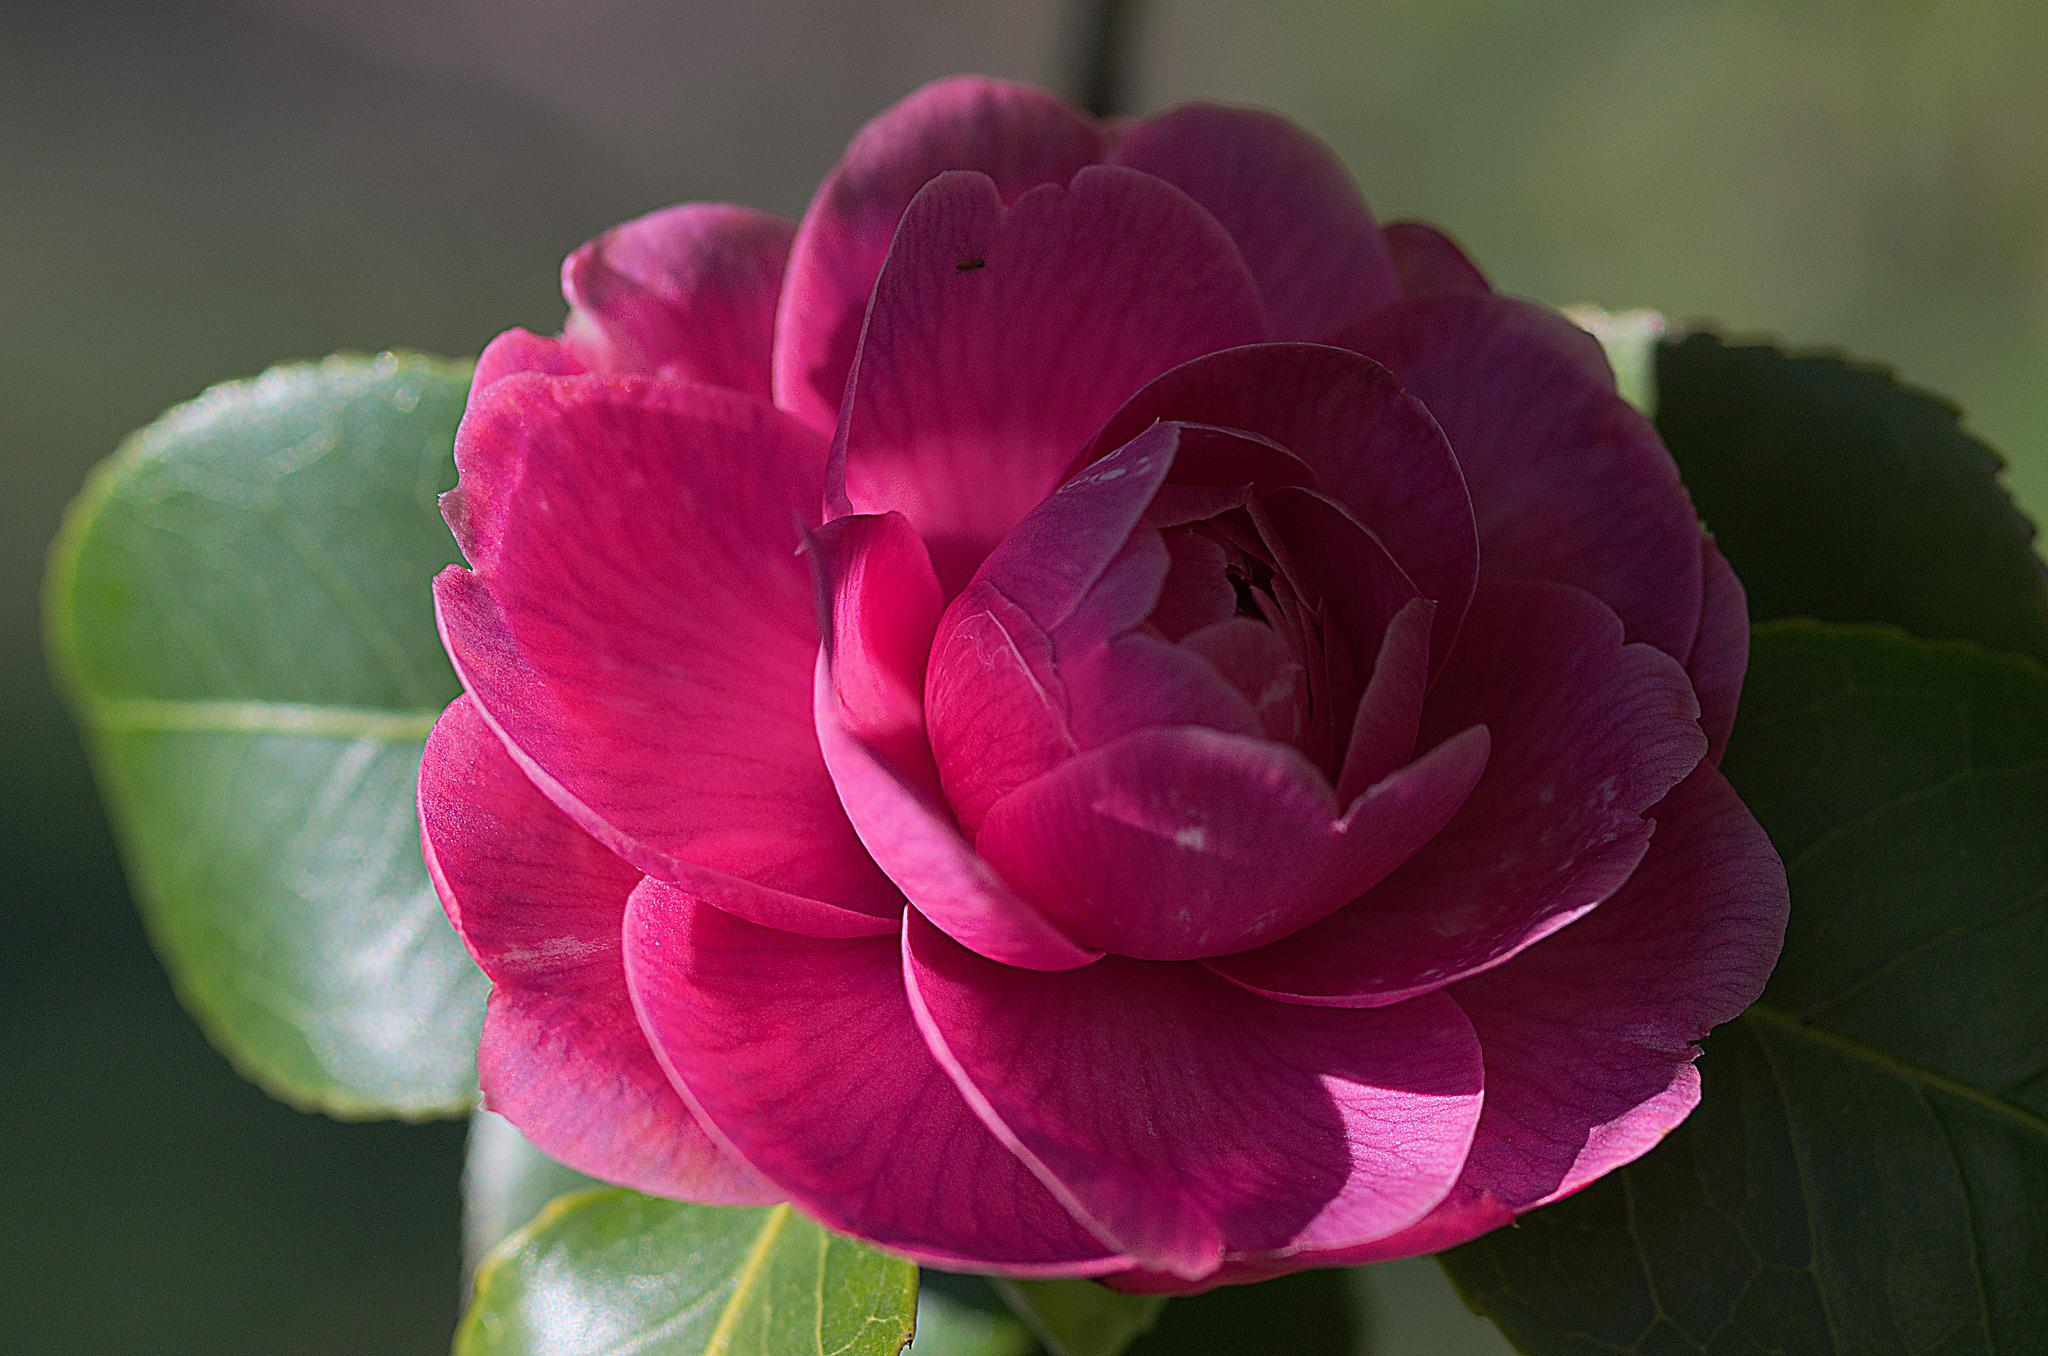 """Camellia flower 01"" by Isabel Saij"